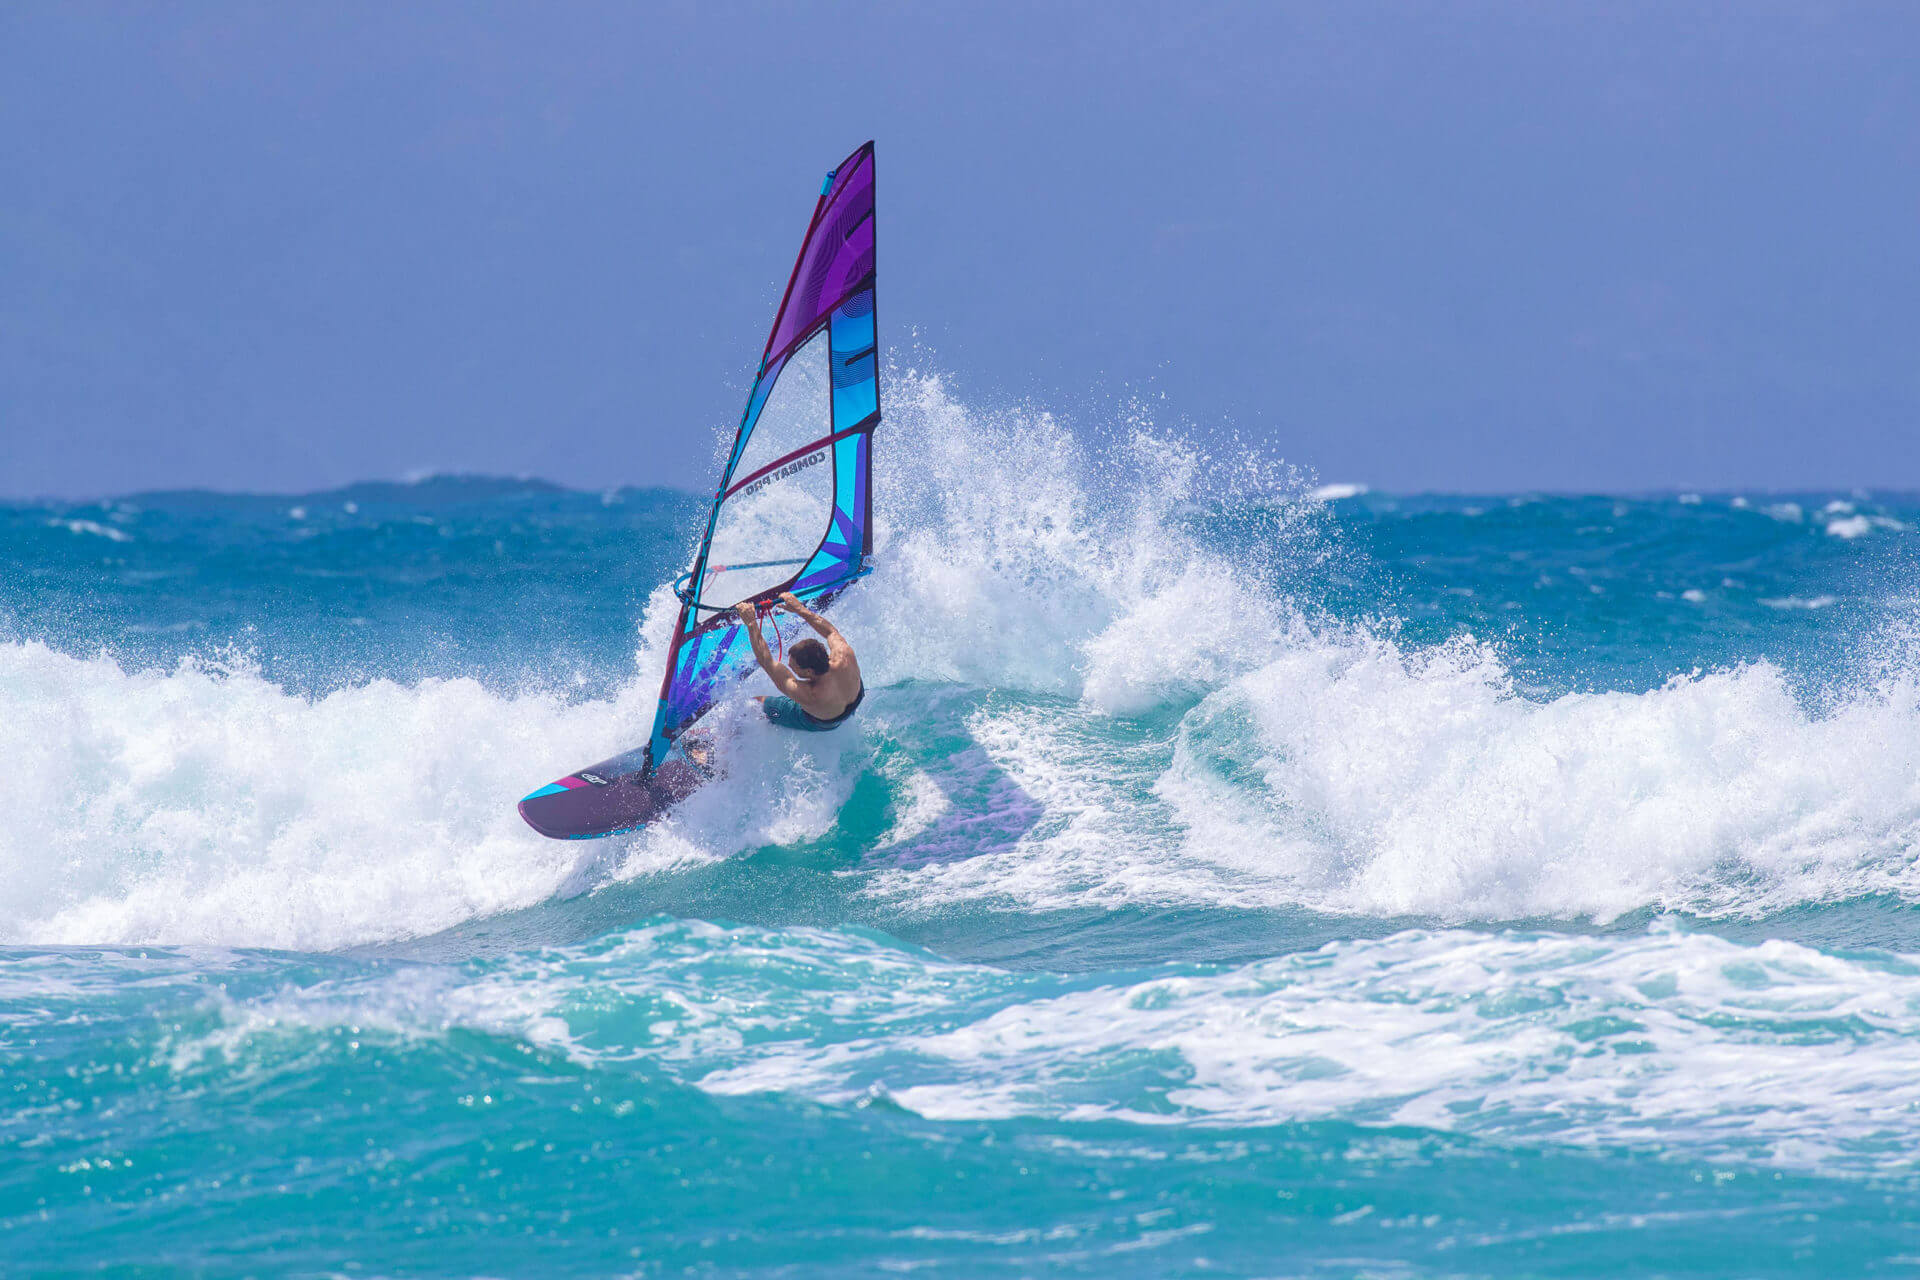 pevny-windsurf-jp-australia